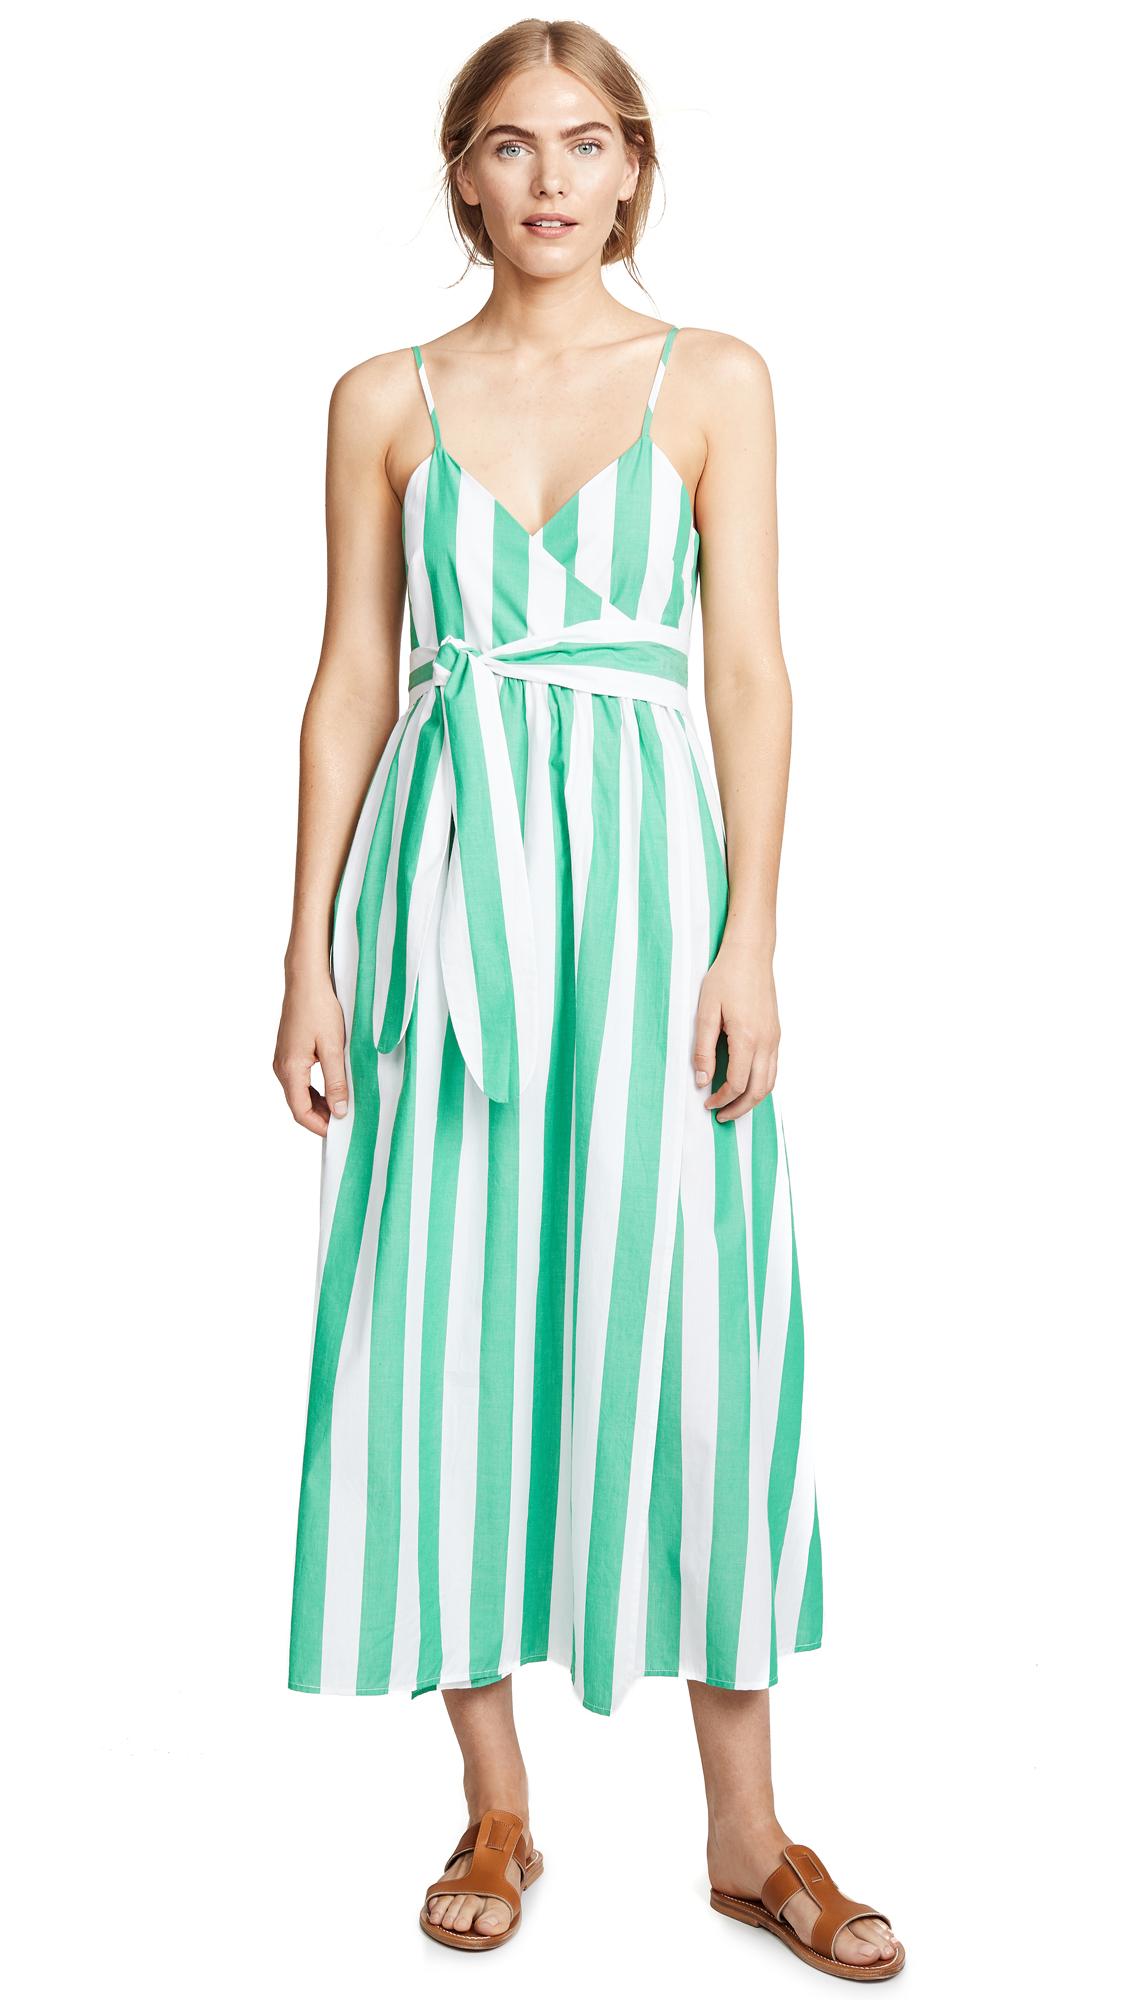 Mara Hoffman Alma Dress - Bungalow Stripe